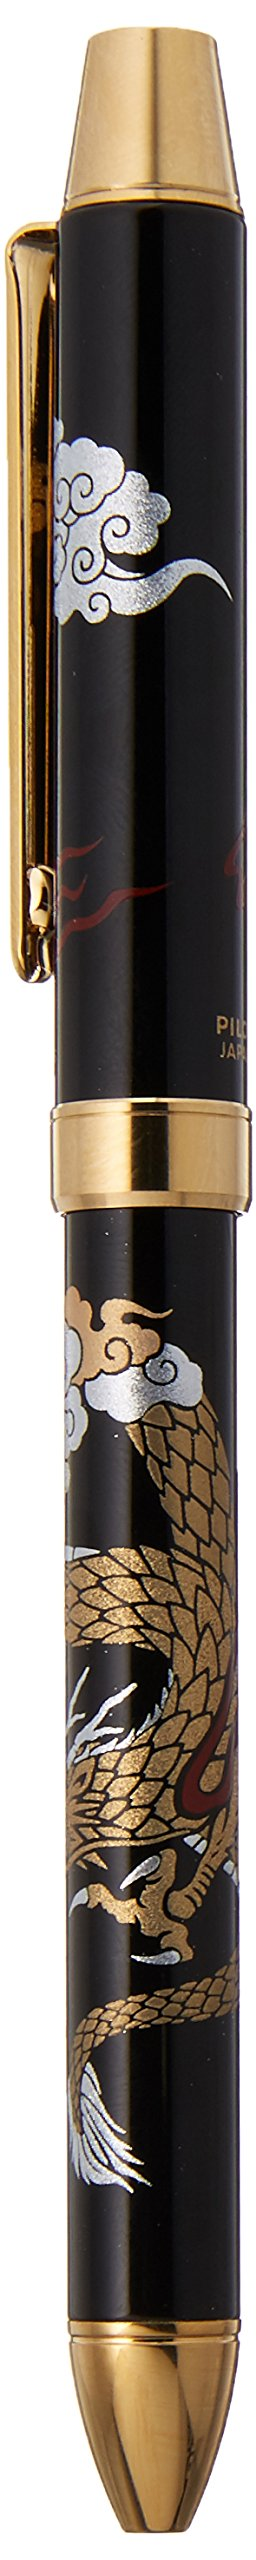 Pilot Mechanical Pencil, 0.5mm + Ballpoint Pen, 0.7mm, Fine, Black and Red, 2+1 Miyabi Emaki, Dragon (BTHM-5SR-R) by Pilot (Image #2)